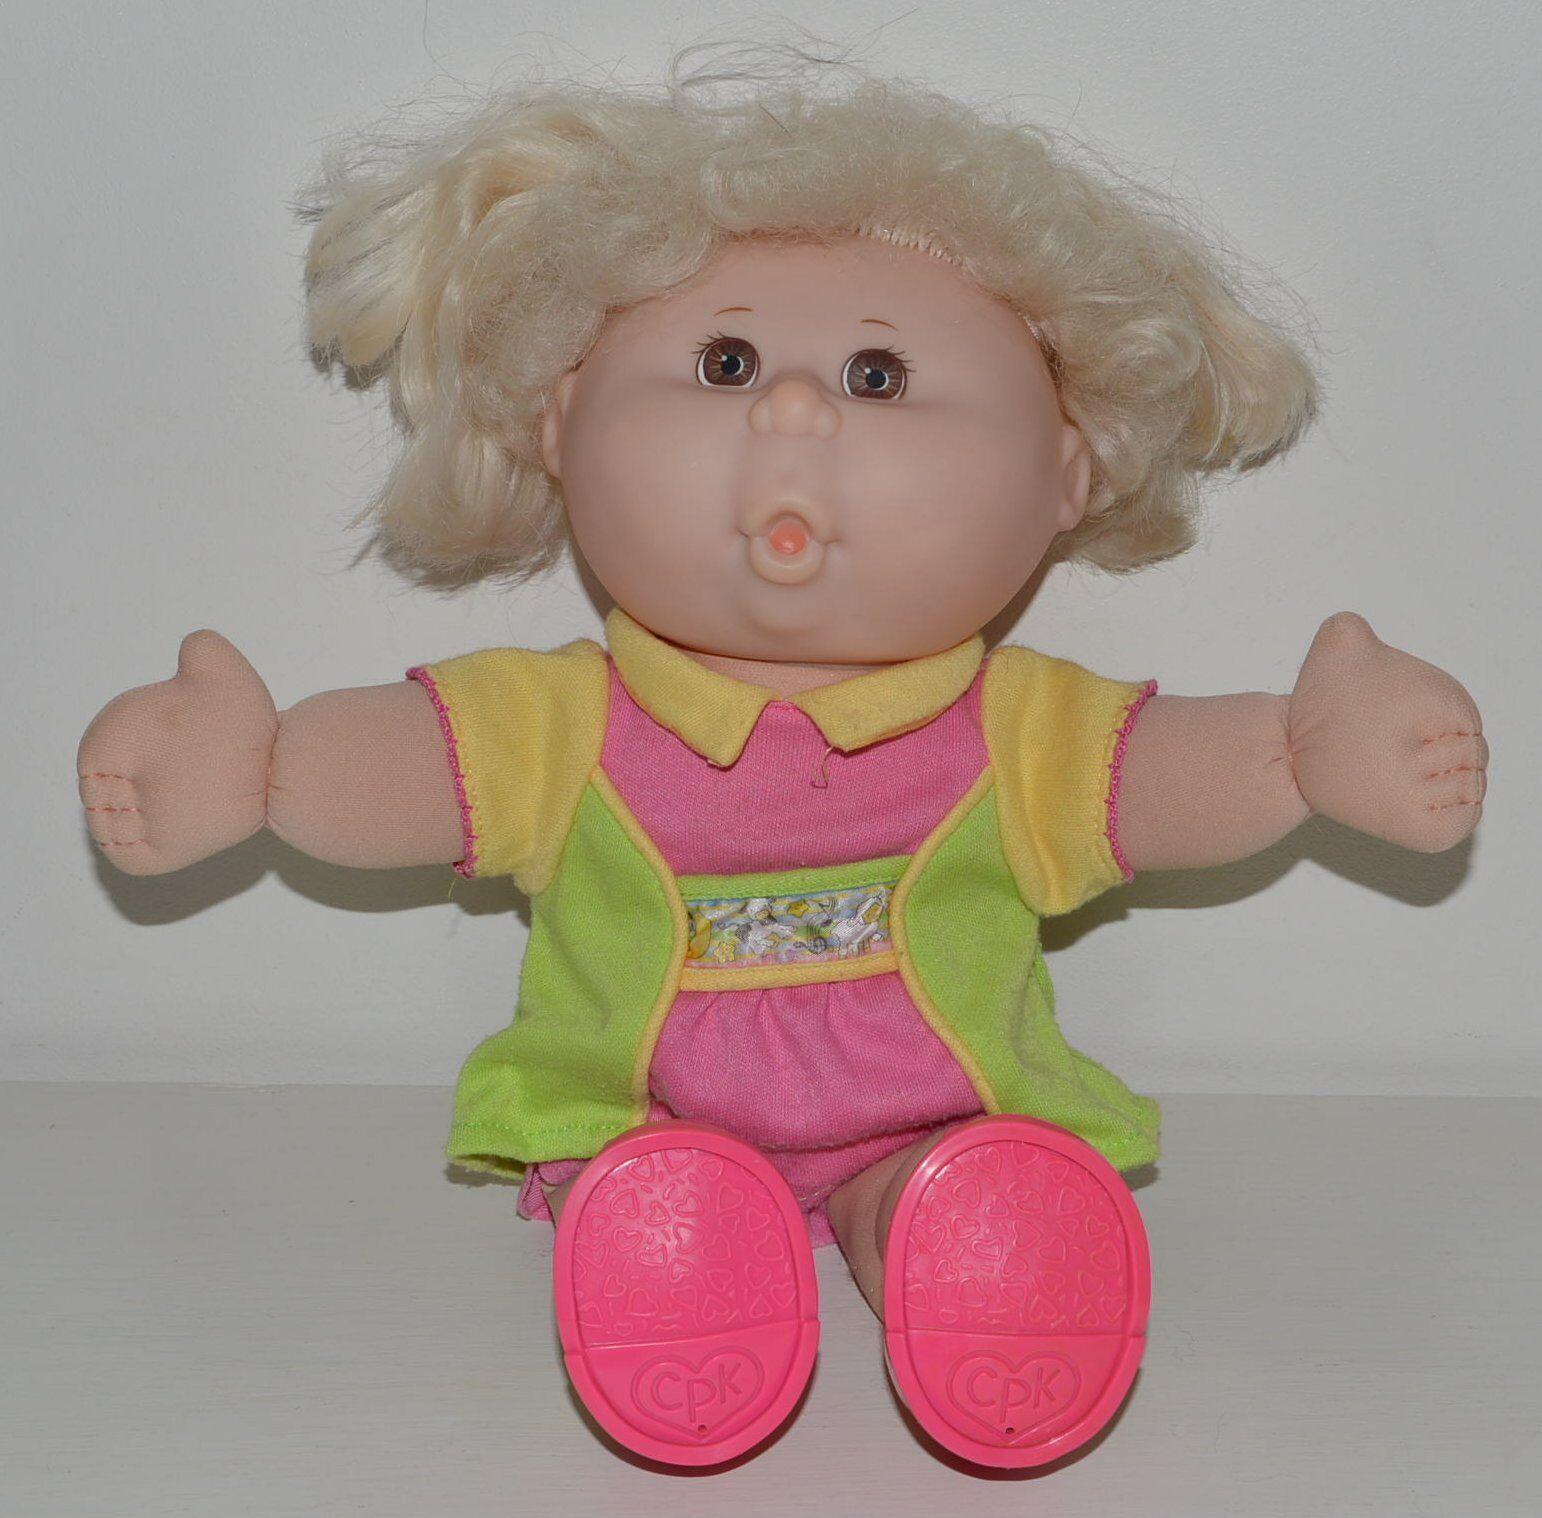 Ancienne poupée vintage CABborsaE PATCH  bambini PATOUF parlante 1995 GPK  con il 60% di sconto